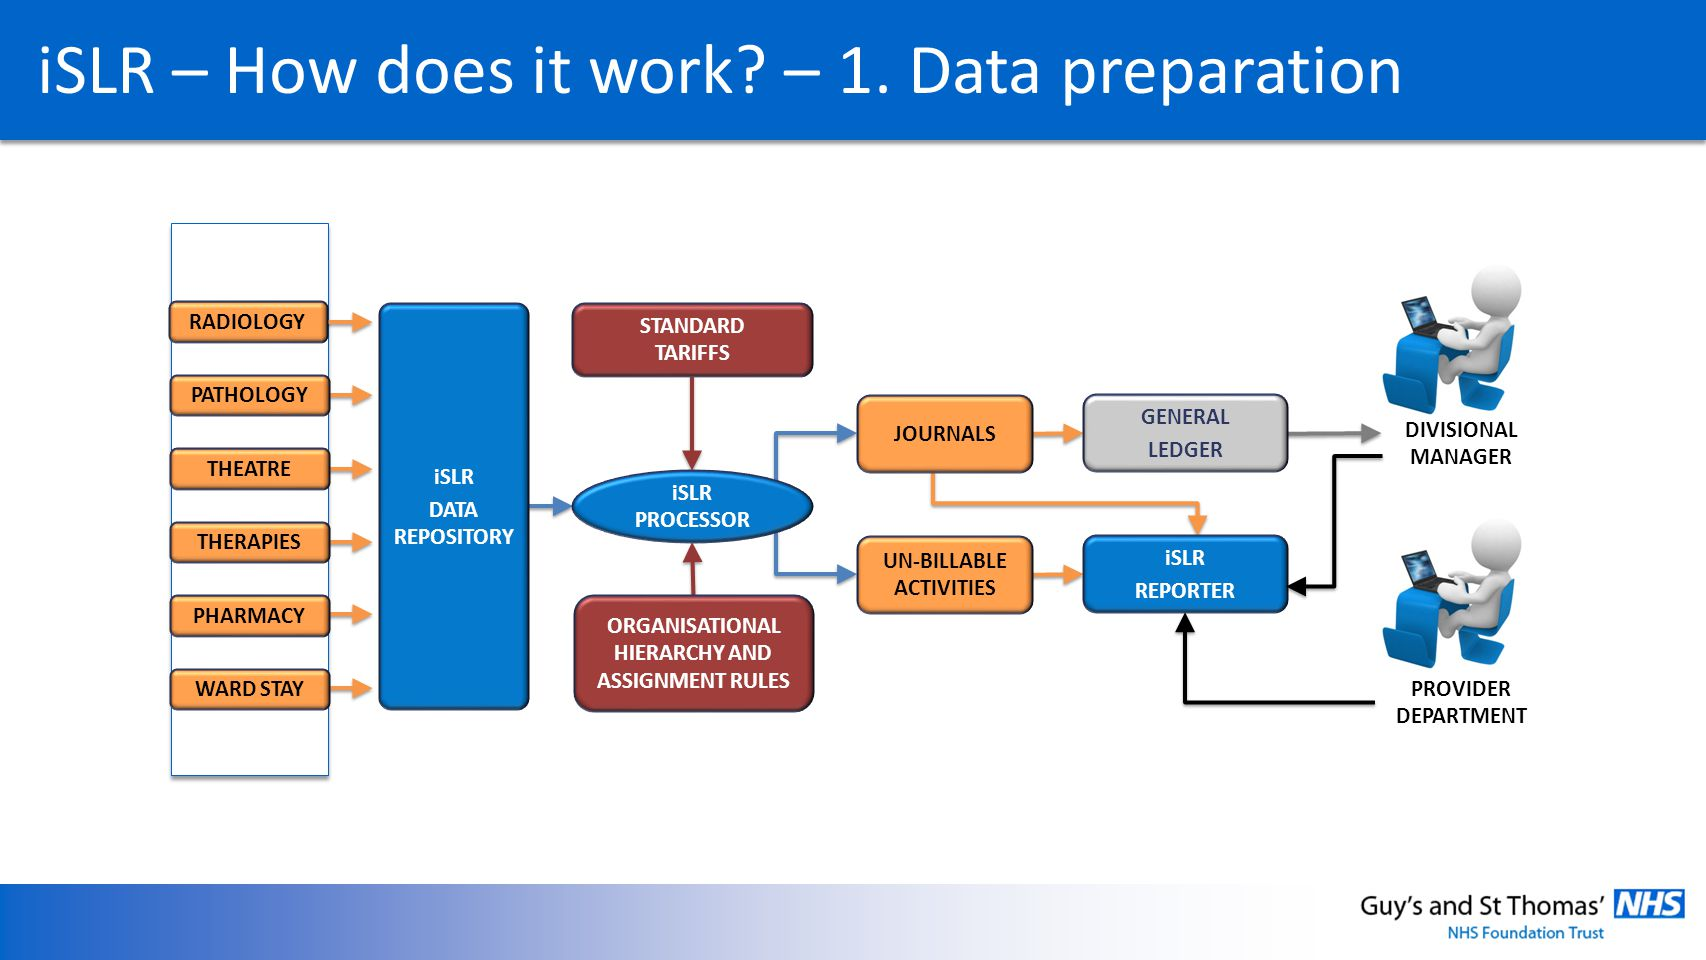 iSLR – How does it work? – 1. Data preparation RADIOLOGY PATHOLOGY THEATRE THERAPIES PHARMACY WARD STAY iSLR DATA REPOSITORY STANDARD TARIFFS ORGANISA